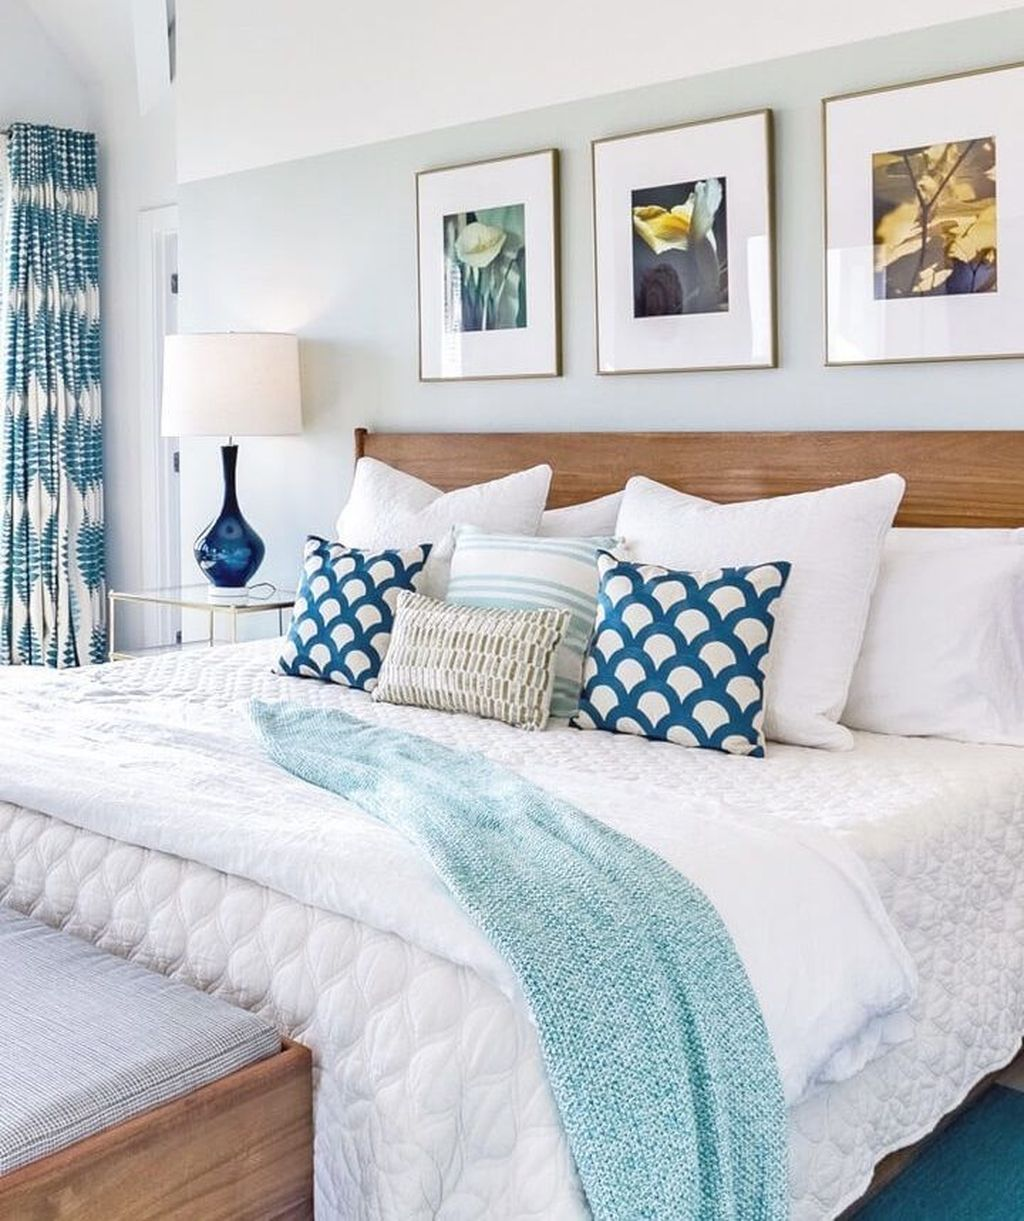 Admirable Beach House Decor Ideas You Should Copy 24